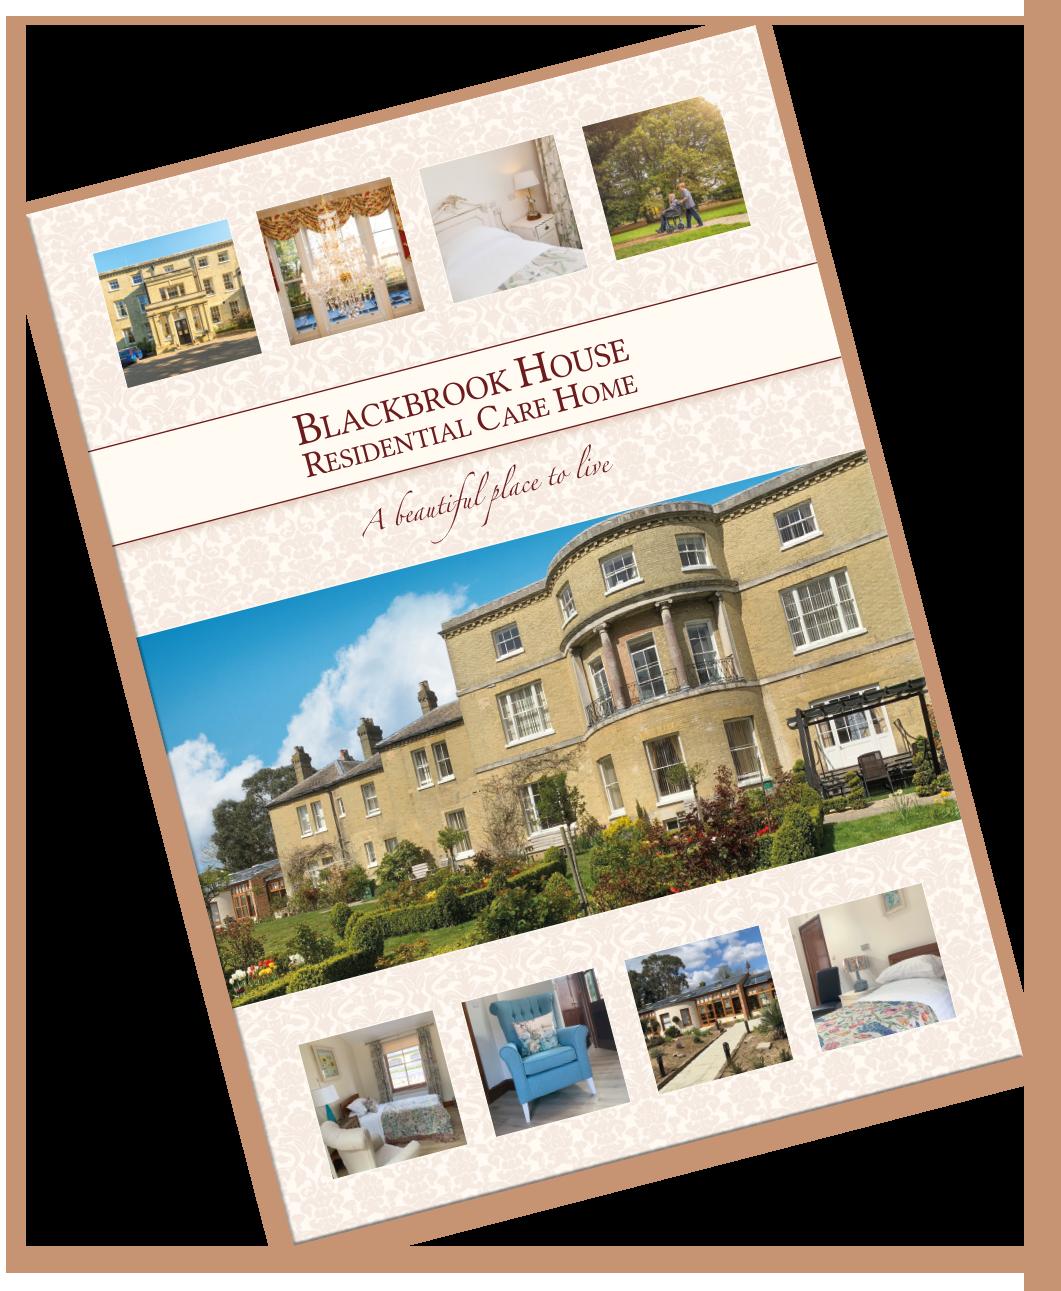 Blackbrook House's brochure